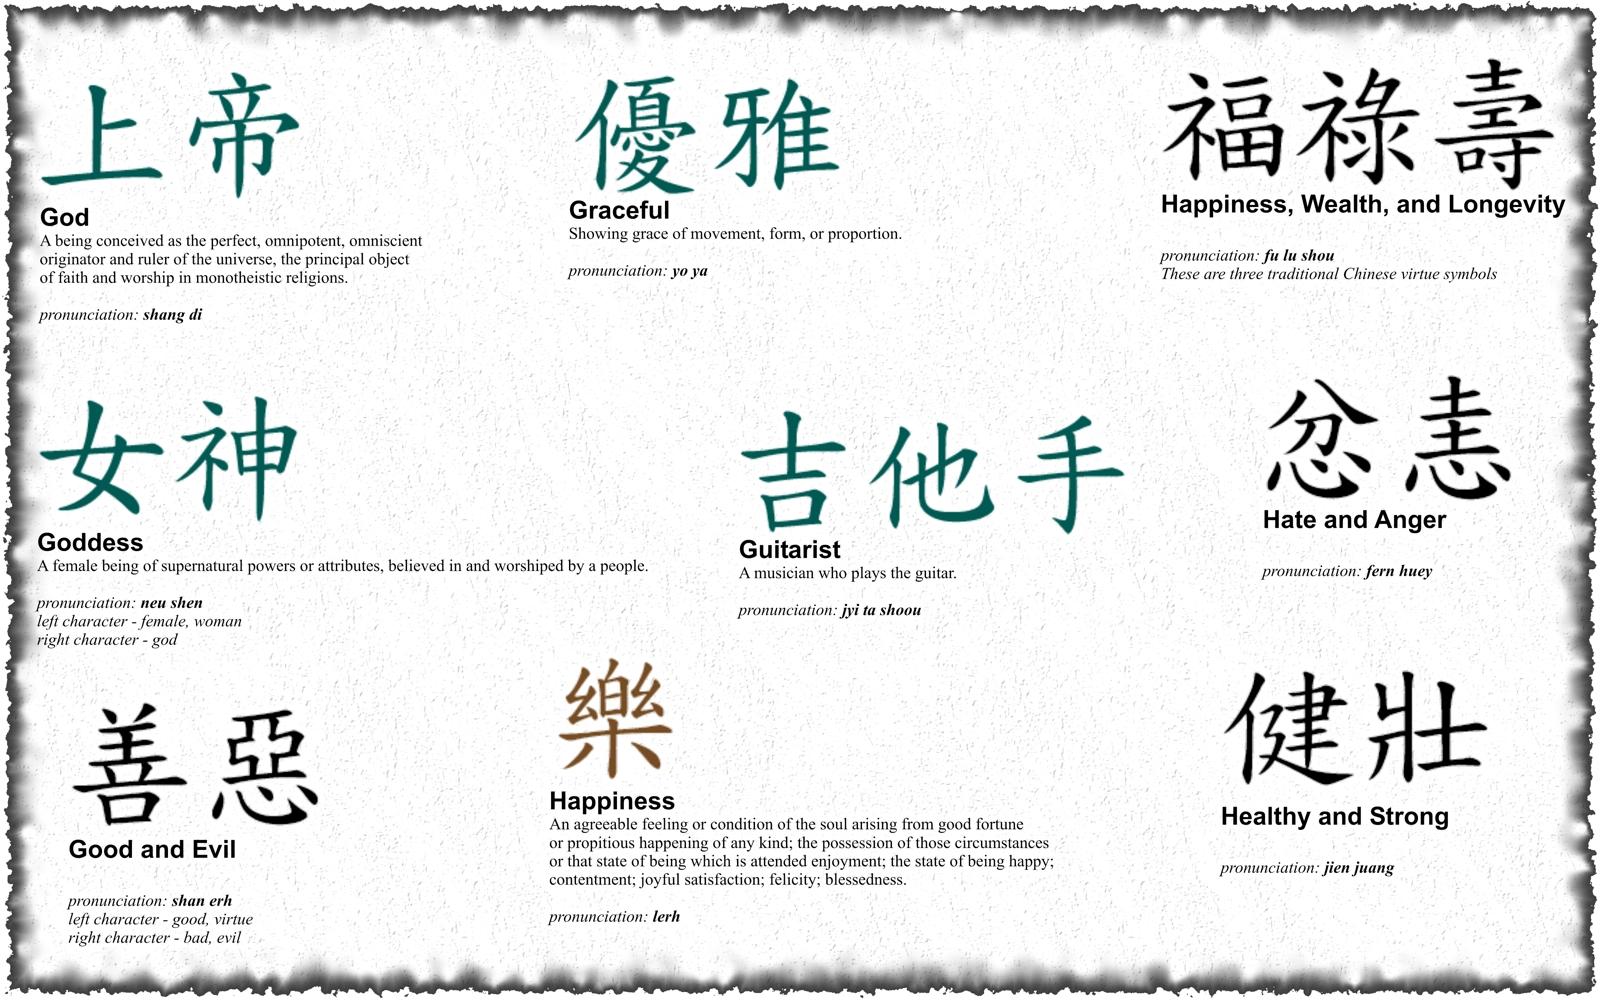 ... ://vanuax.com/japanese-tattoo-designs-your-name-in-kanji-symbols.html